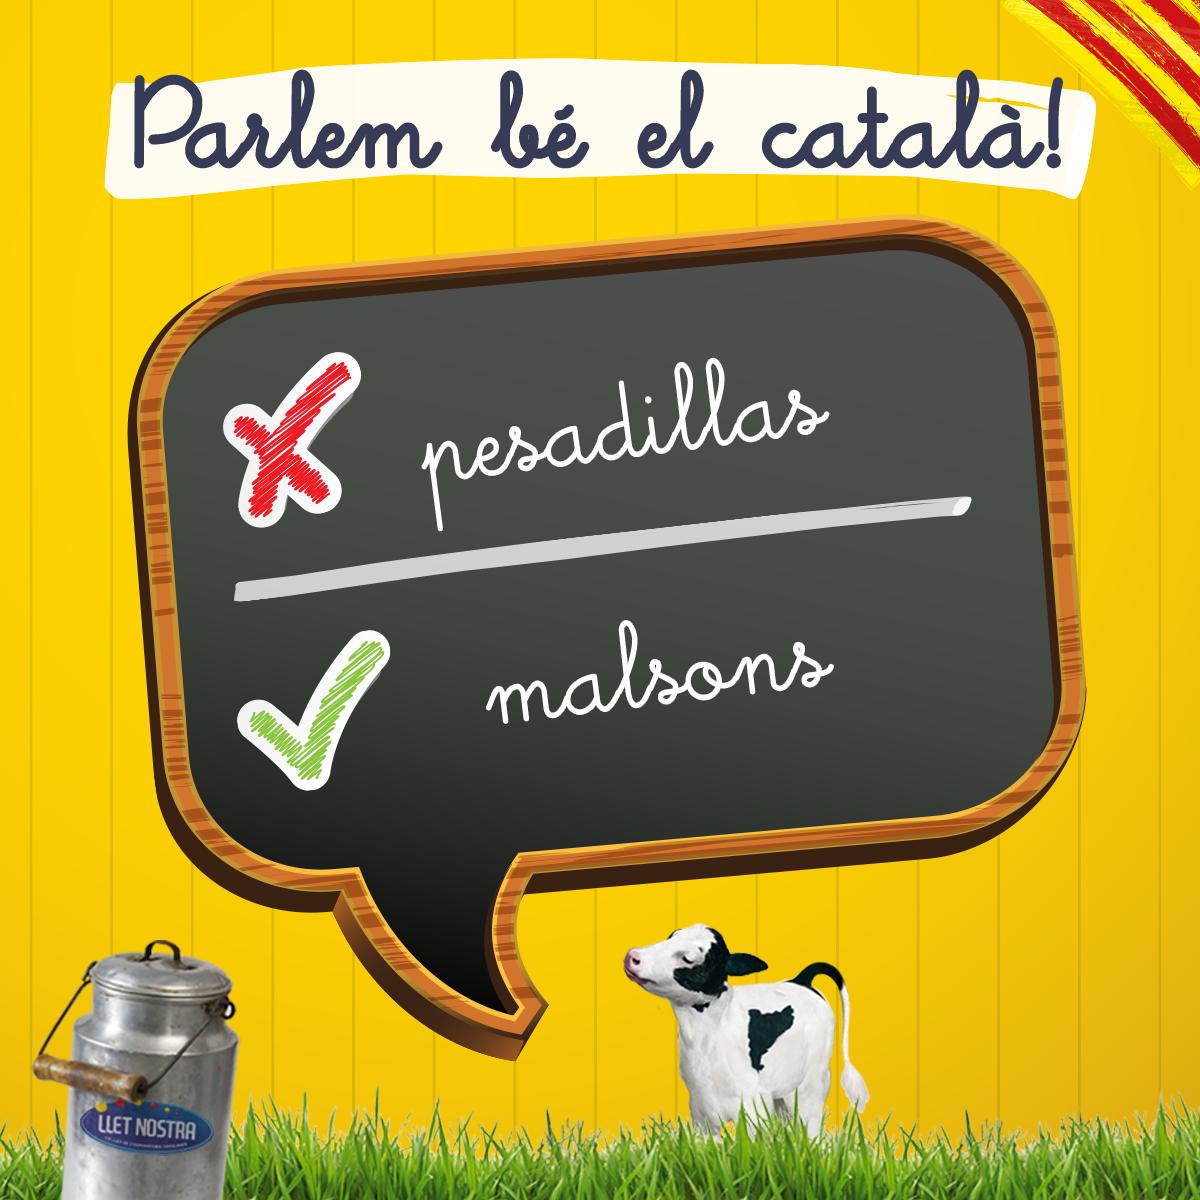 #femcollaambelcatalà #català